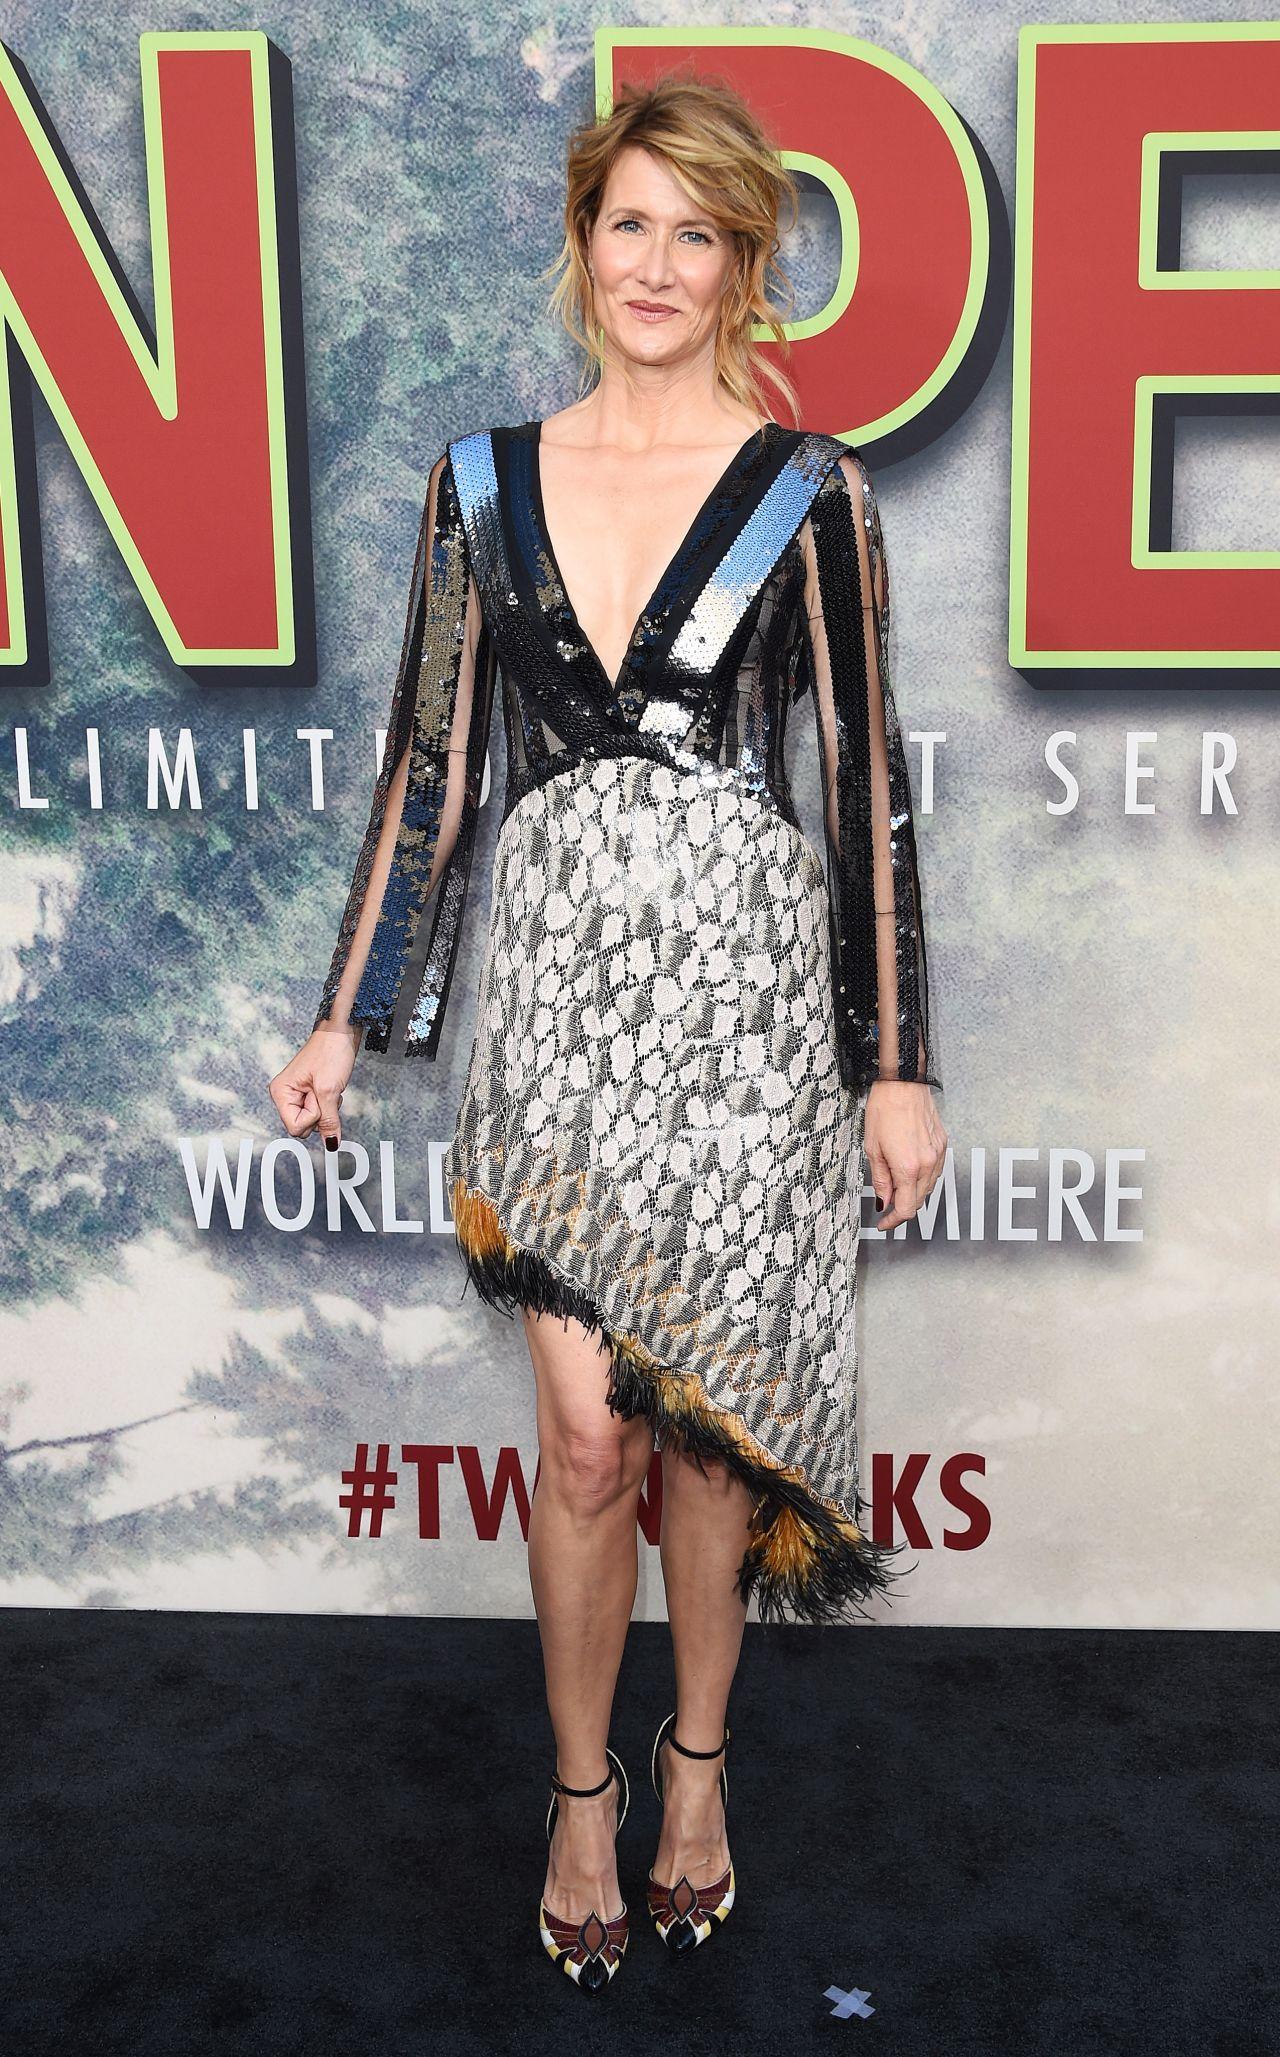 Laura Dern Twin Peaks Premiere In Los Angeles 05 19 2017